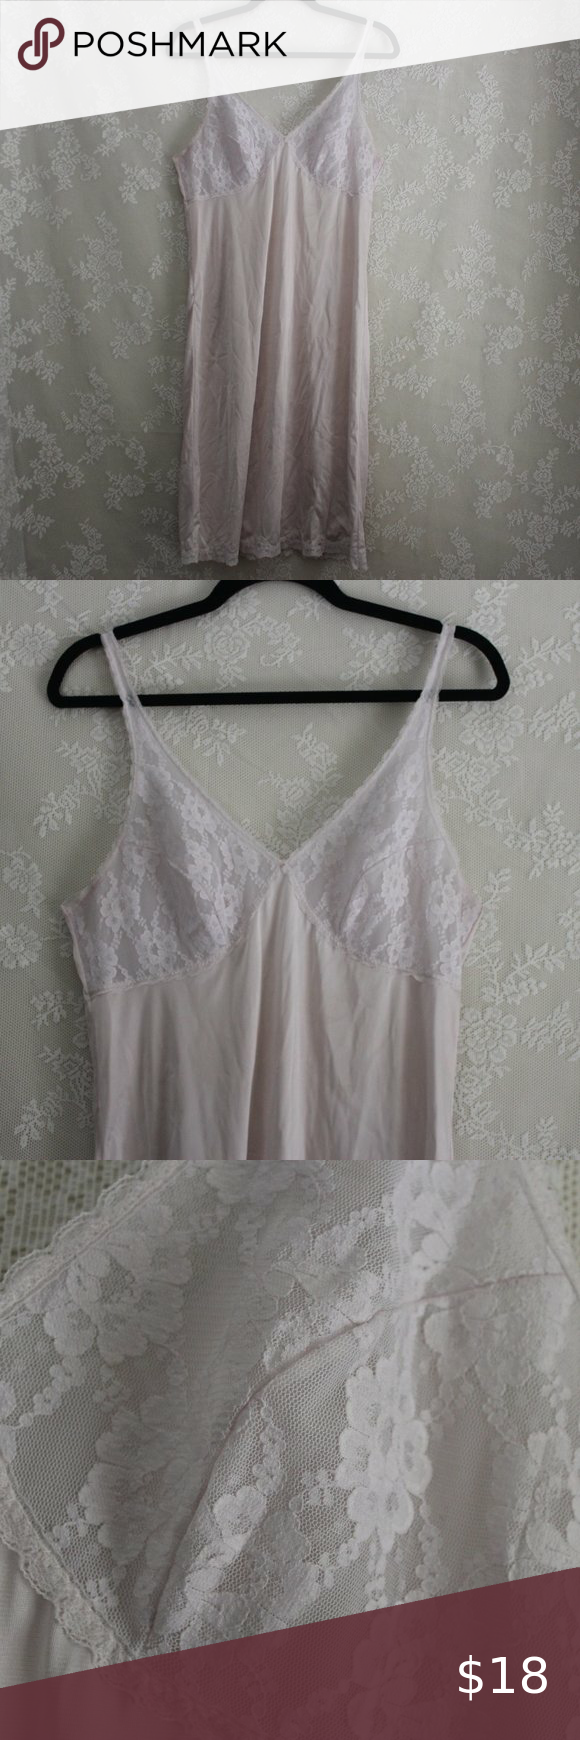 2 20 Sears Ivory White Lace Slip Dress S Lace Slip Dress Lace Slip White Slip Dress [ 1740 x 580 Pixel ]